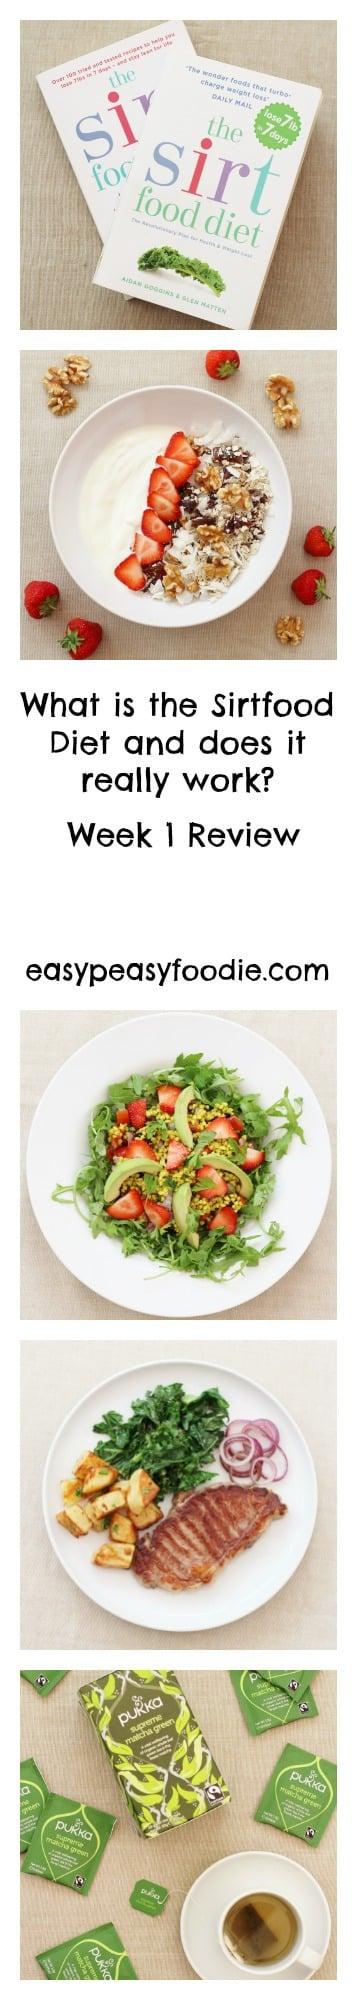 Sirtfood Diet Week 1 Review - pinnable image for Pinterest